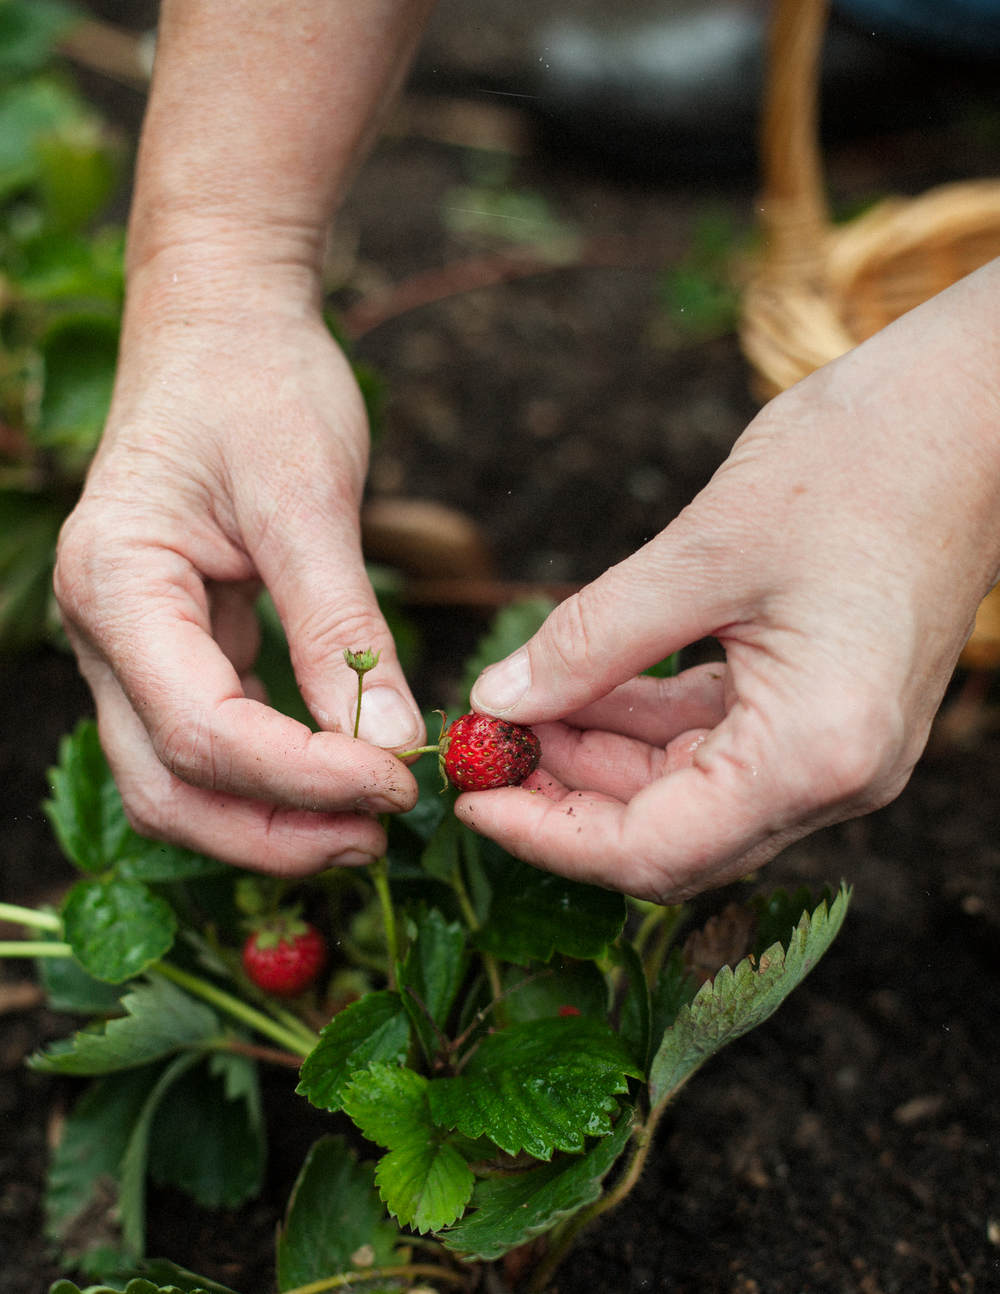 strawberry_picking.jpg